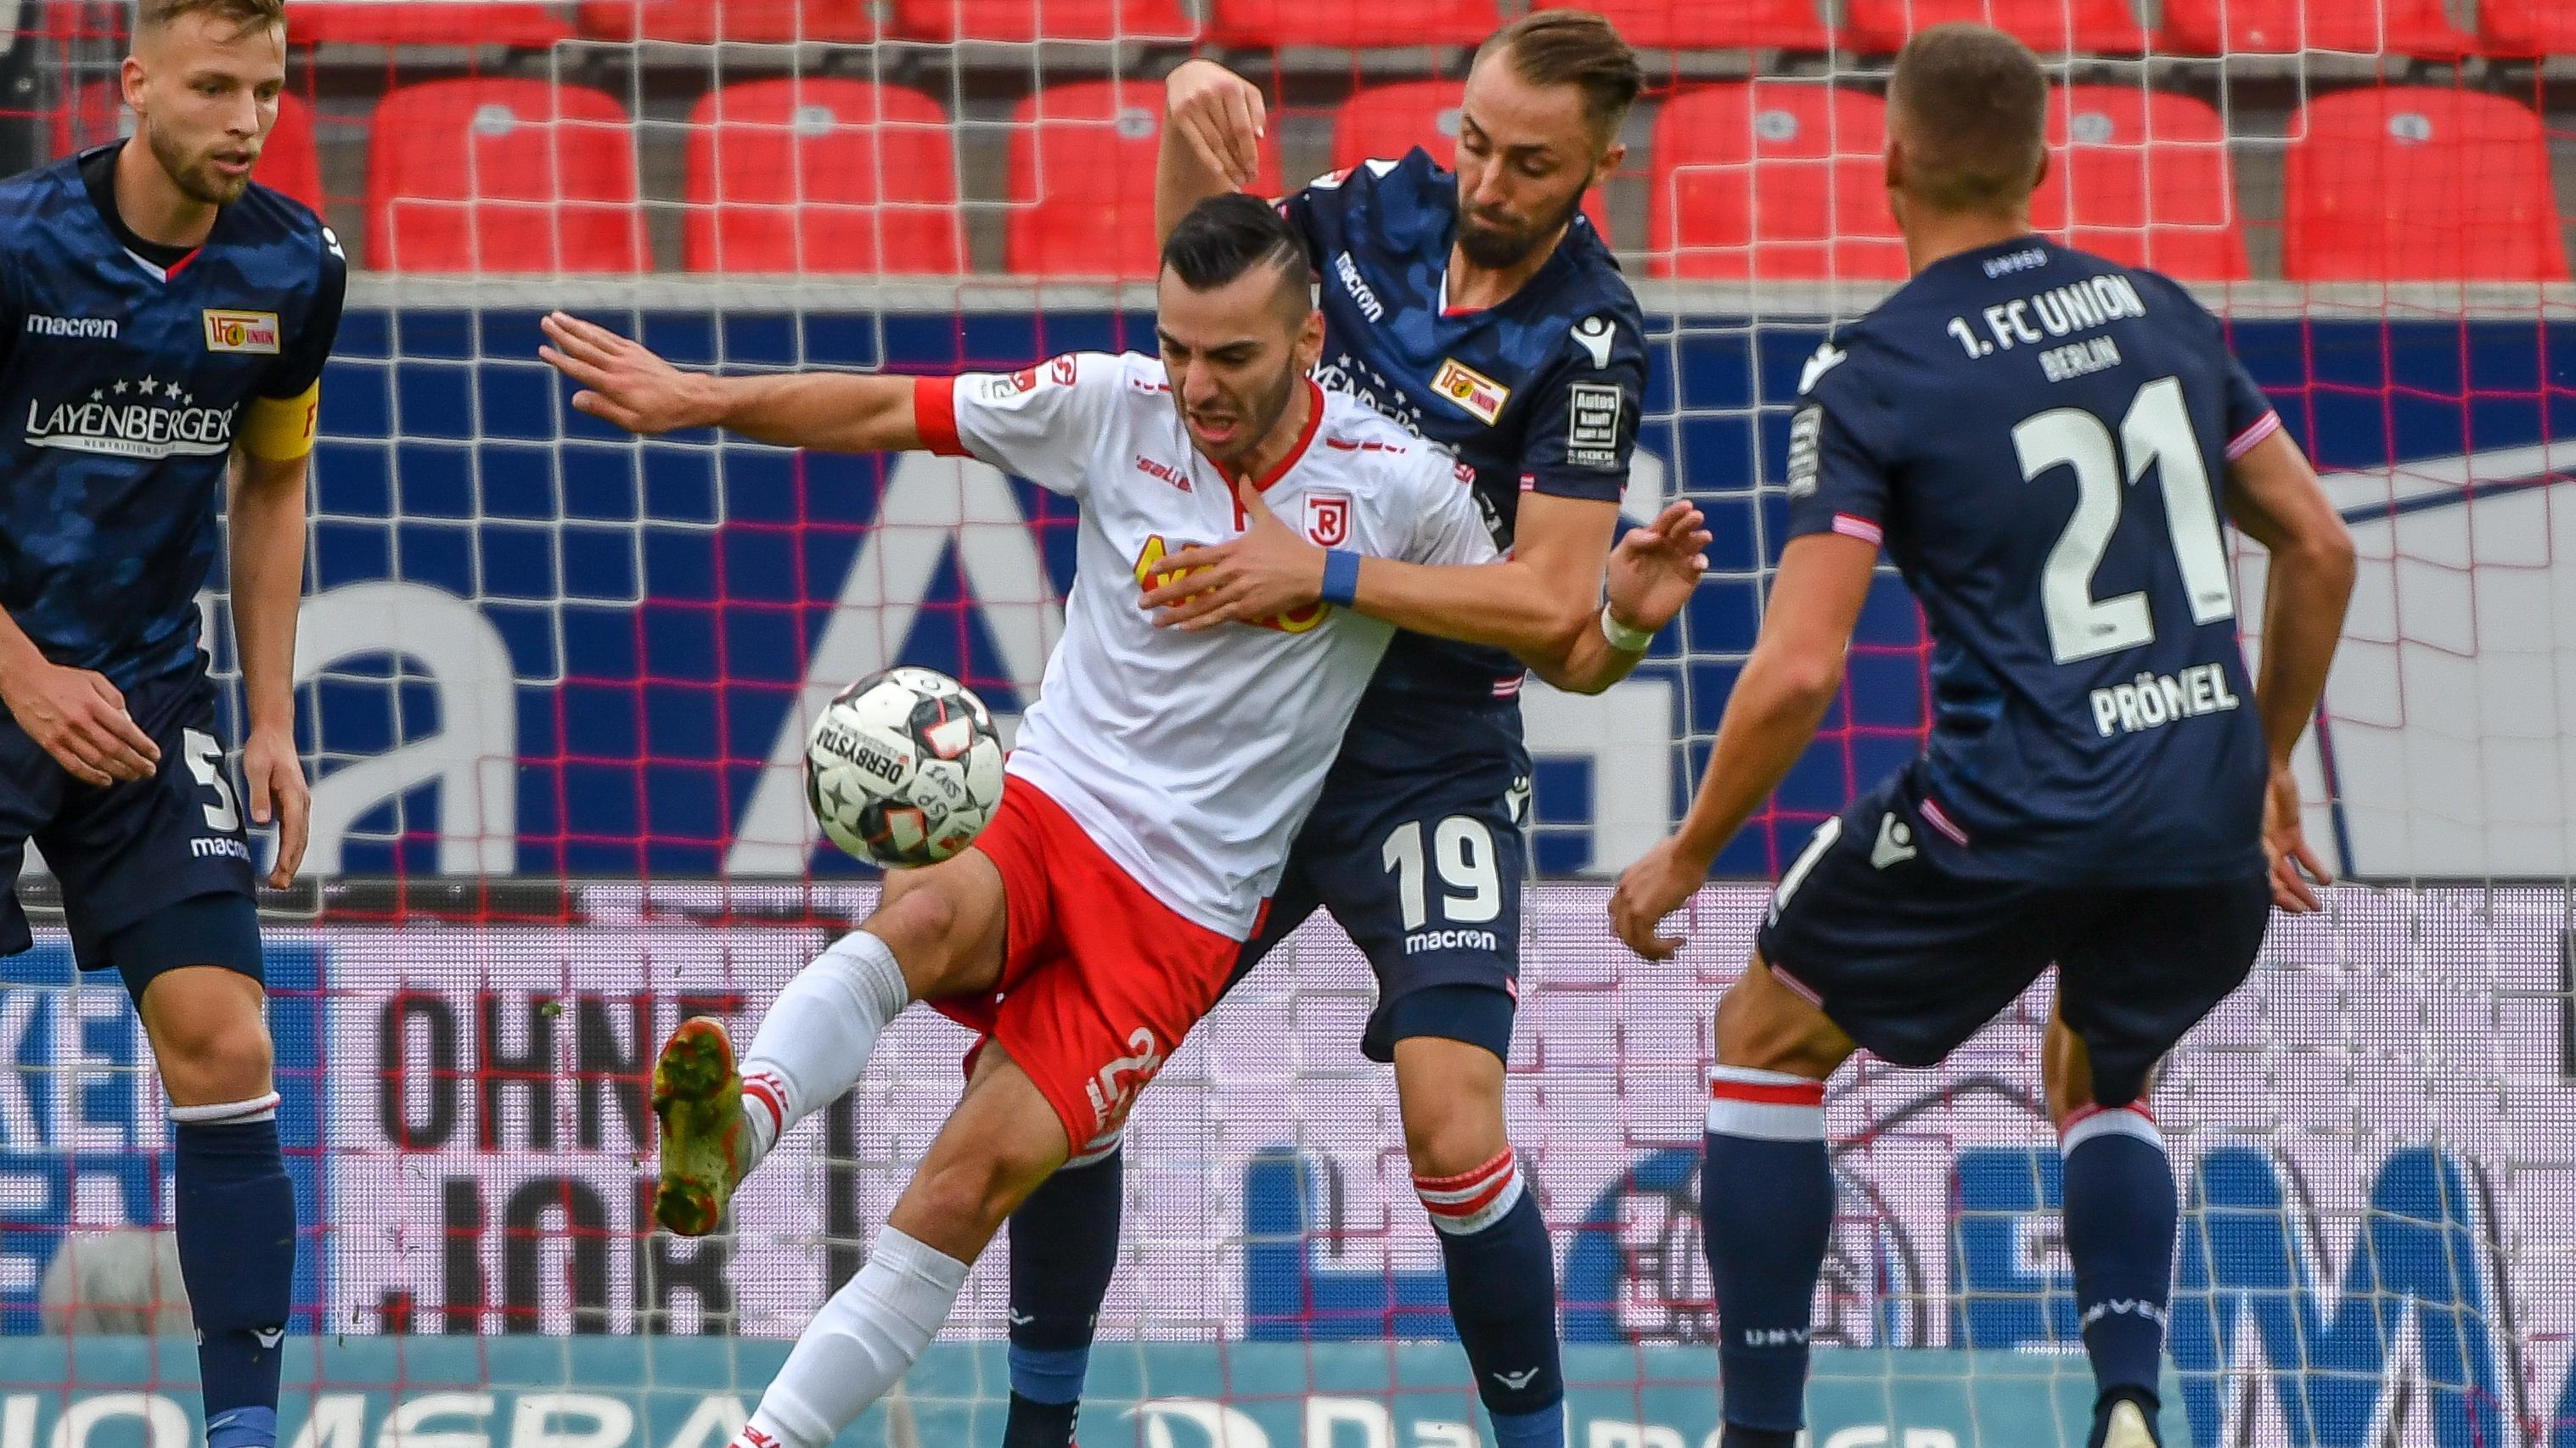 Spielszene SSV Jahn Regensburg - 1 FC Union Berlin